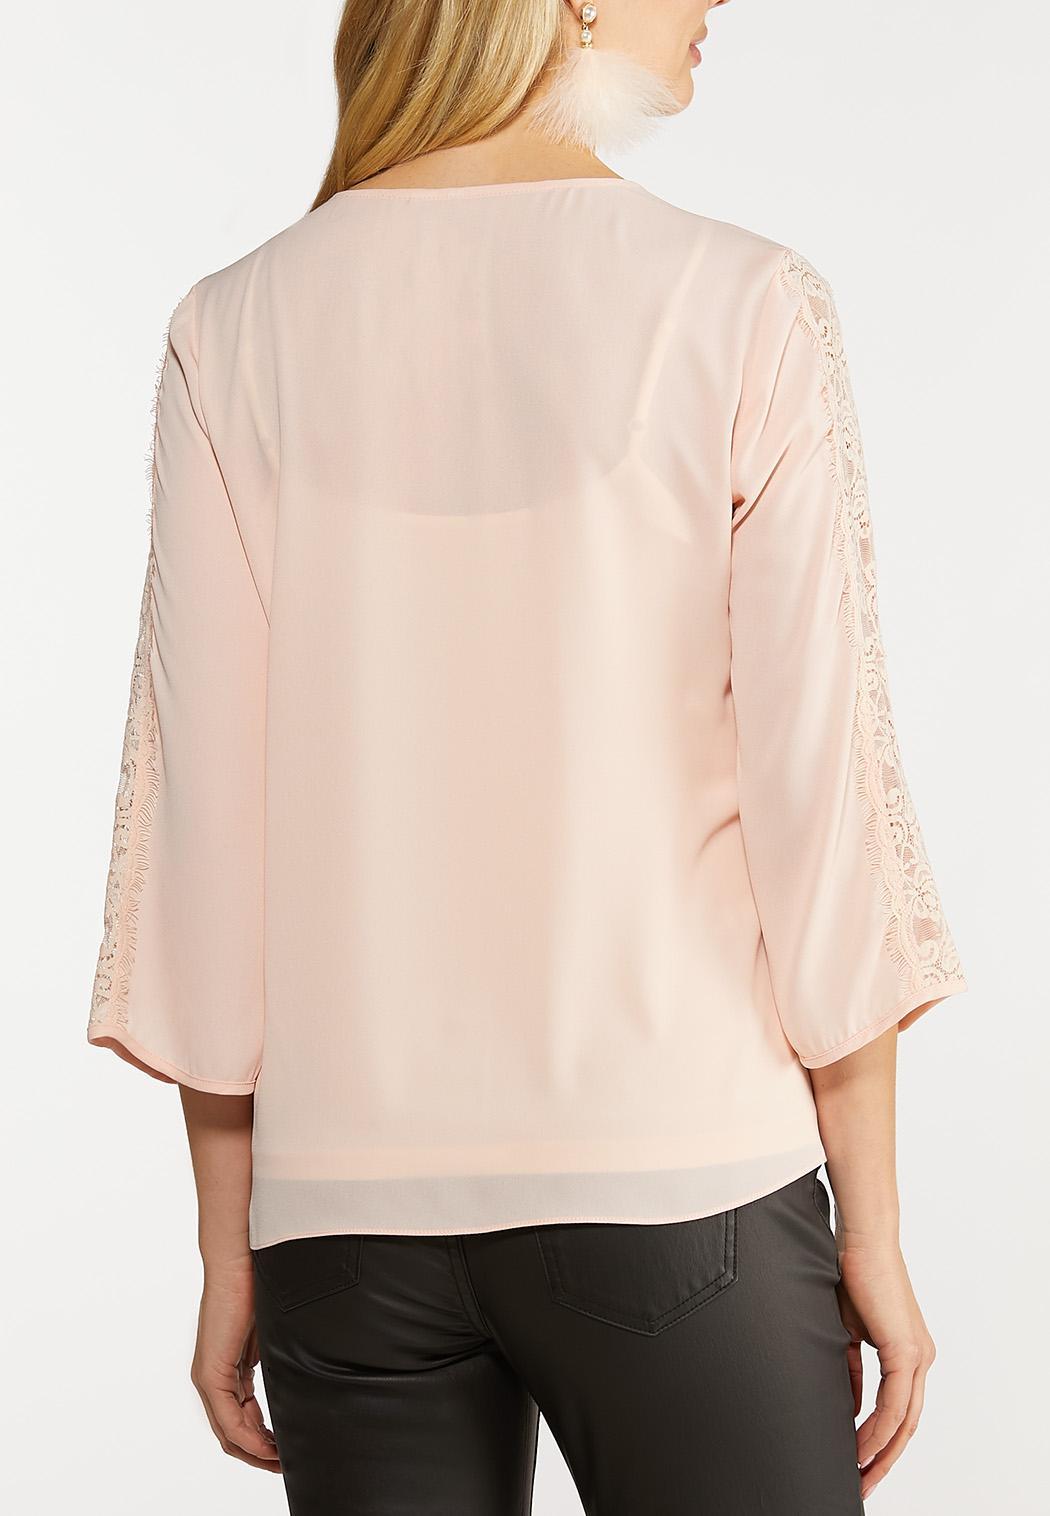 Delicate Lace Trim Top (Item #44106088)